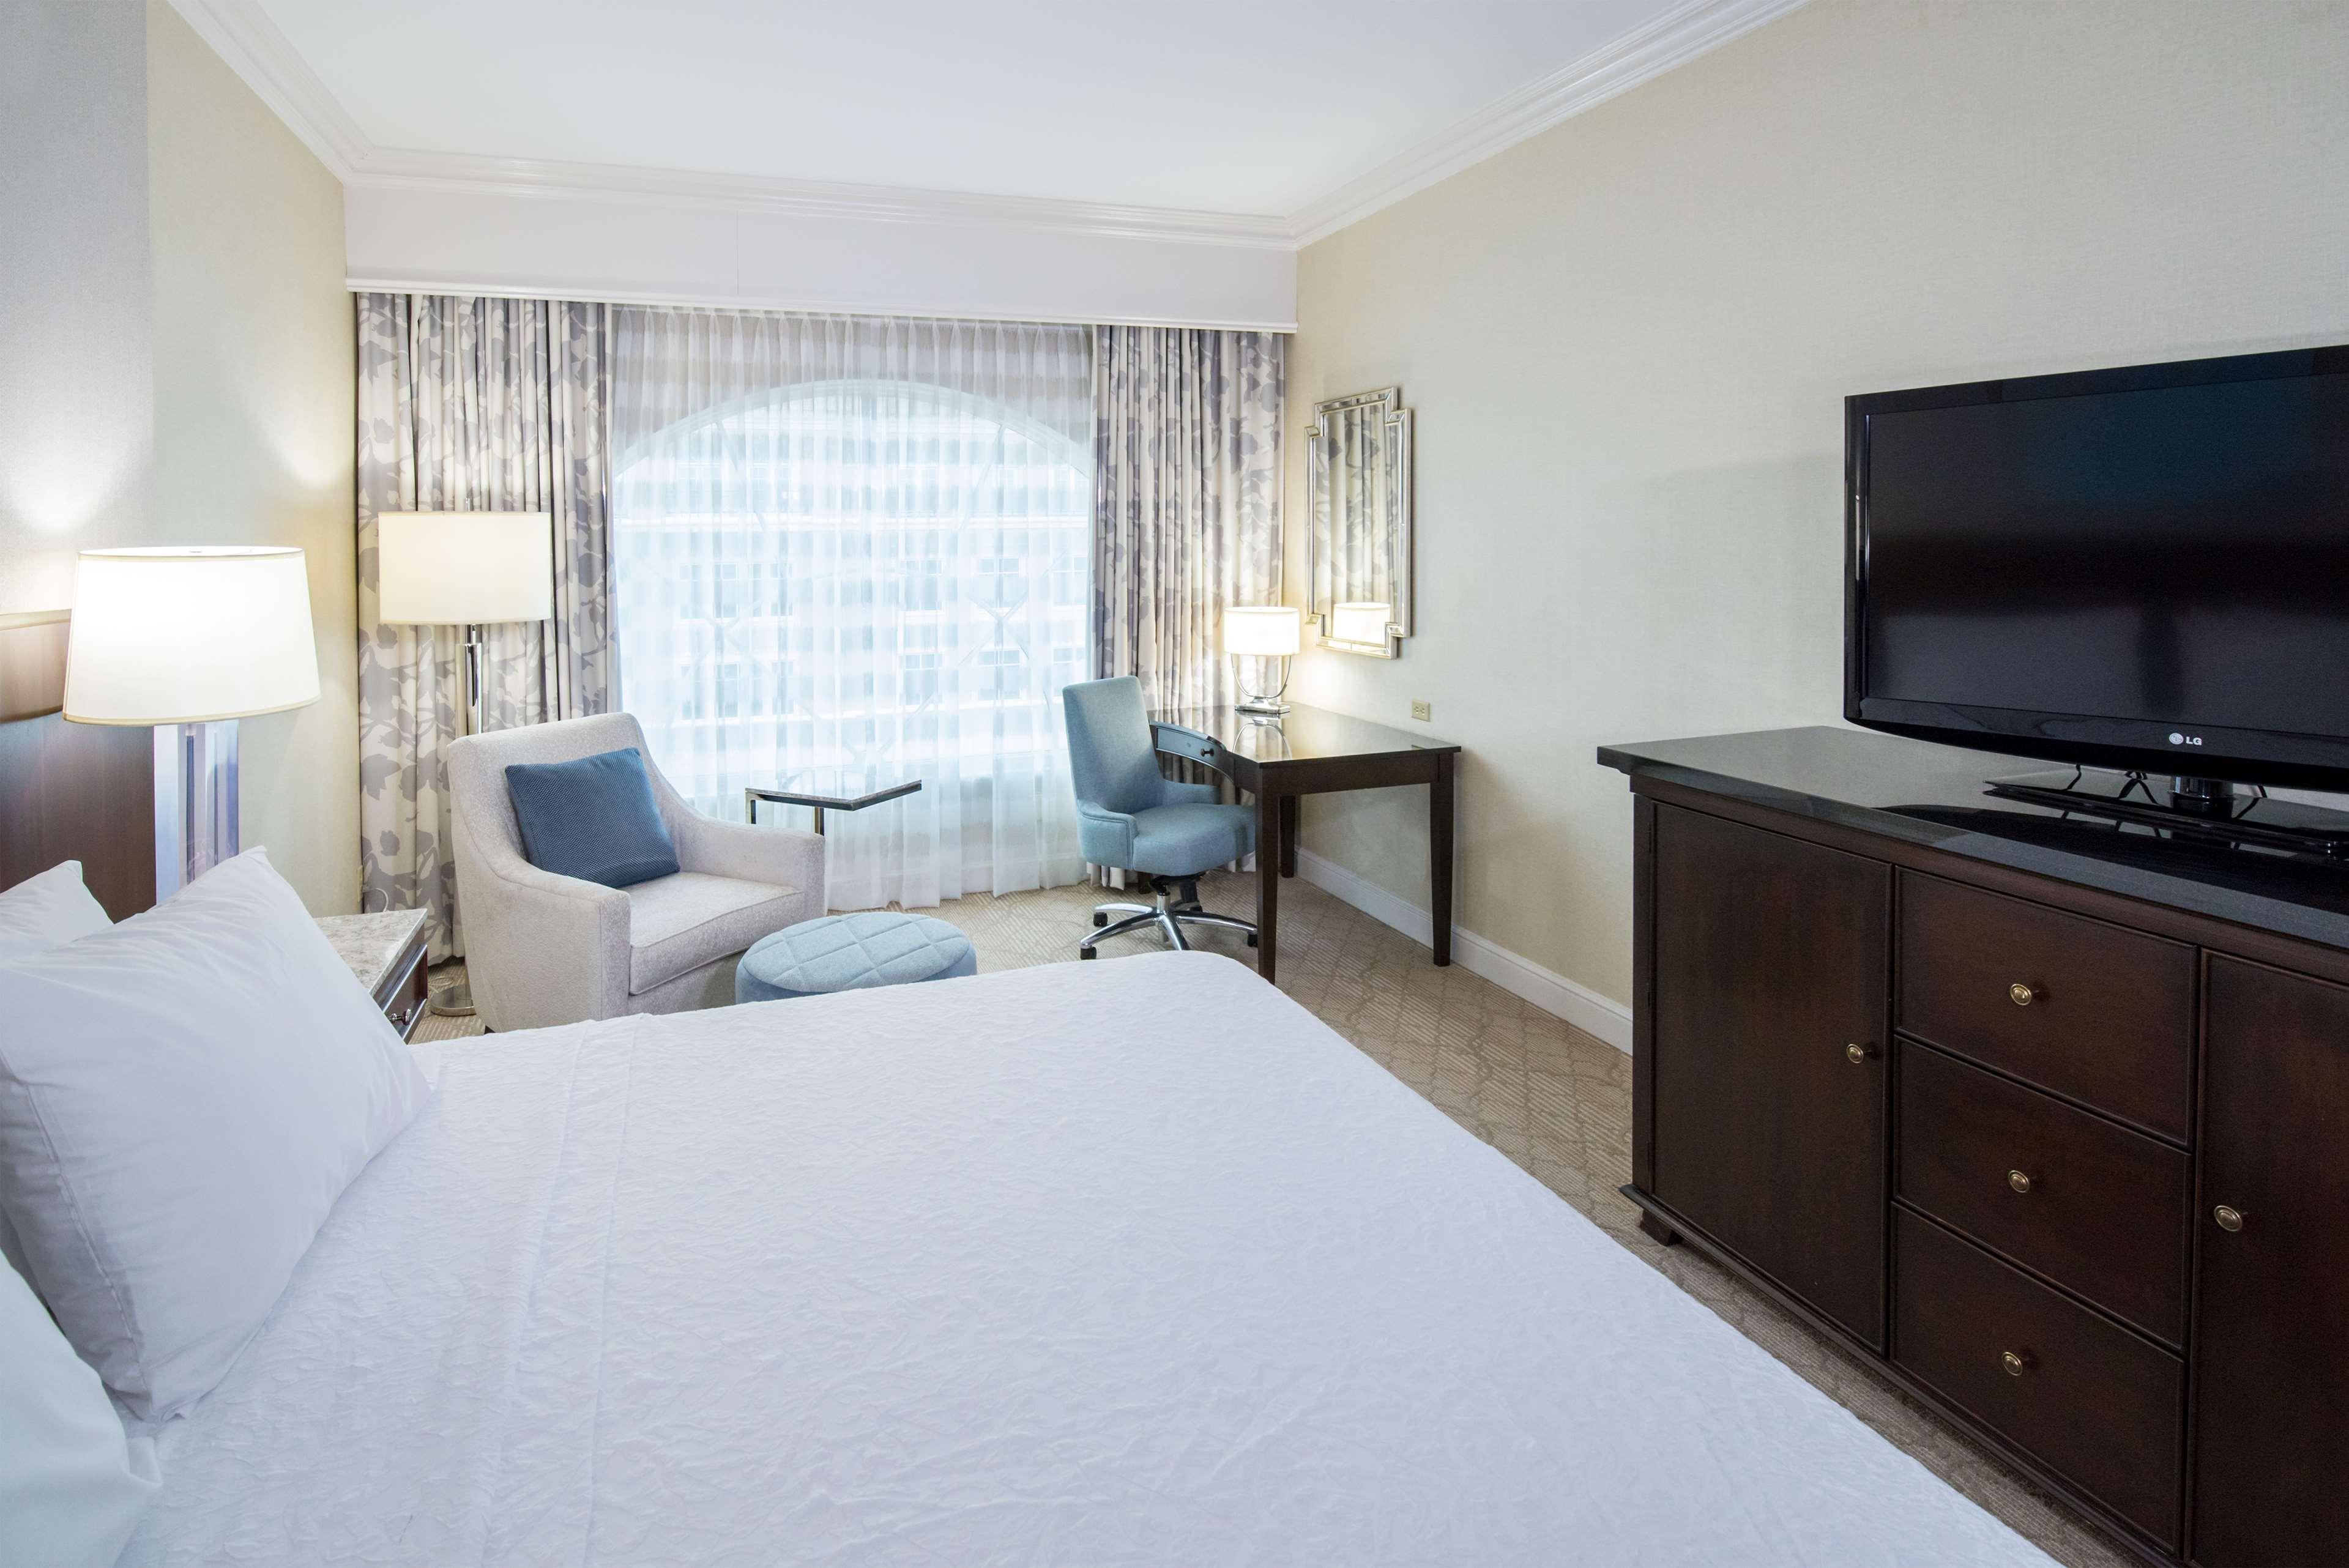 Hampton Inn & Suites Charlotte/South Park at Phillips Place image 26